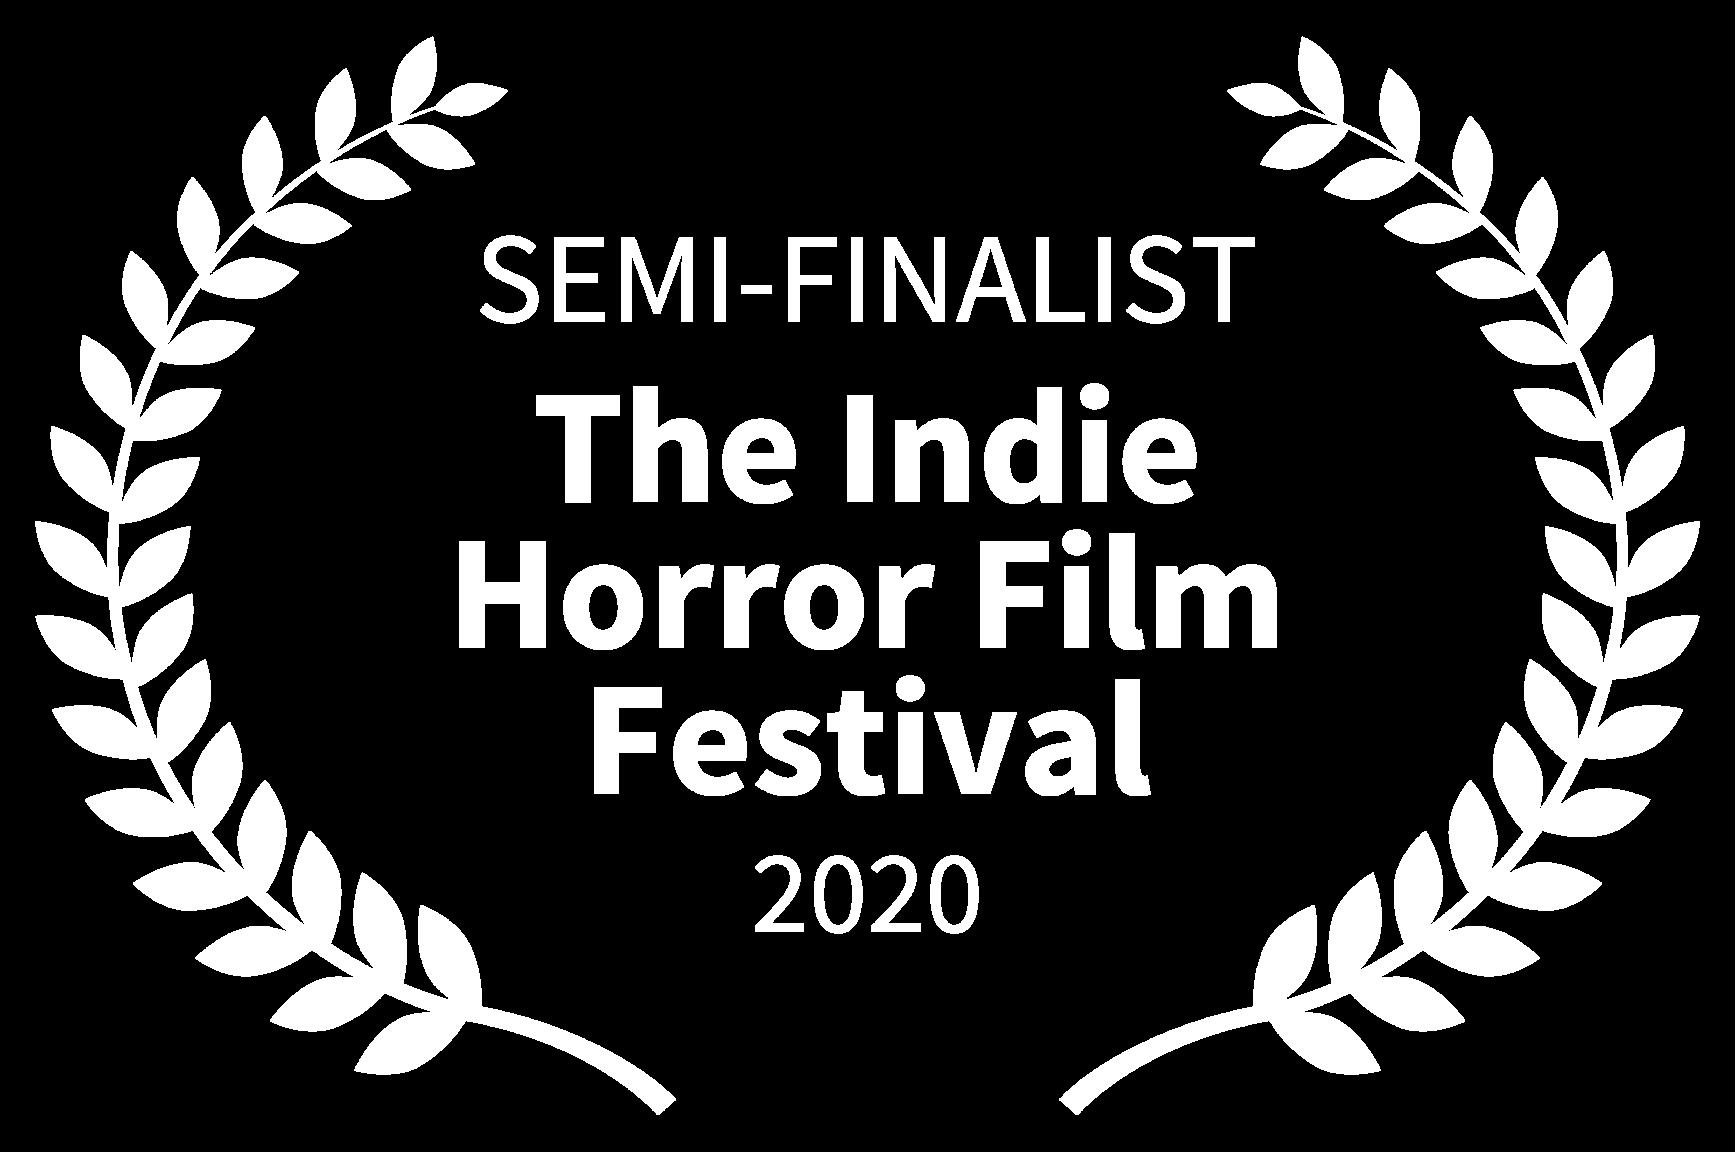 SEMI-FINALIST - The Indie Horror Film Festival - 2020